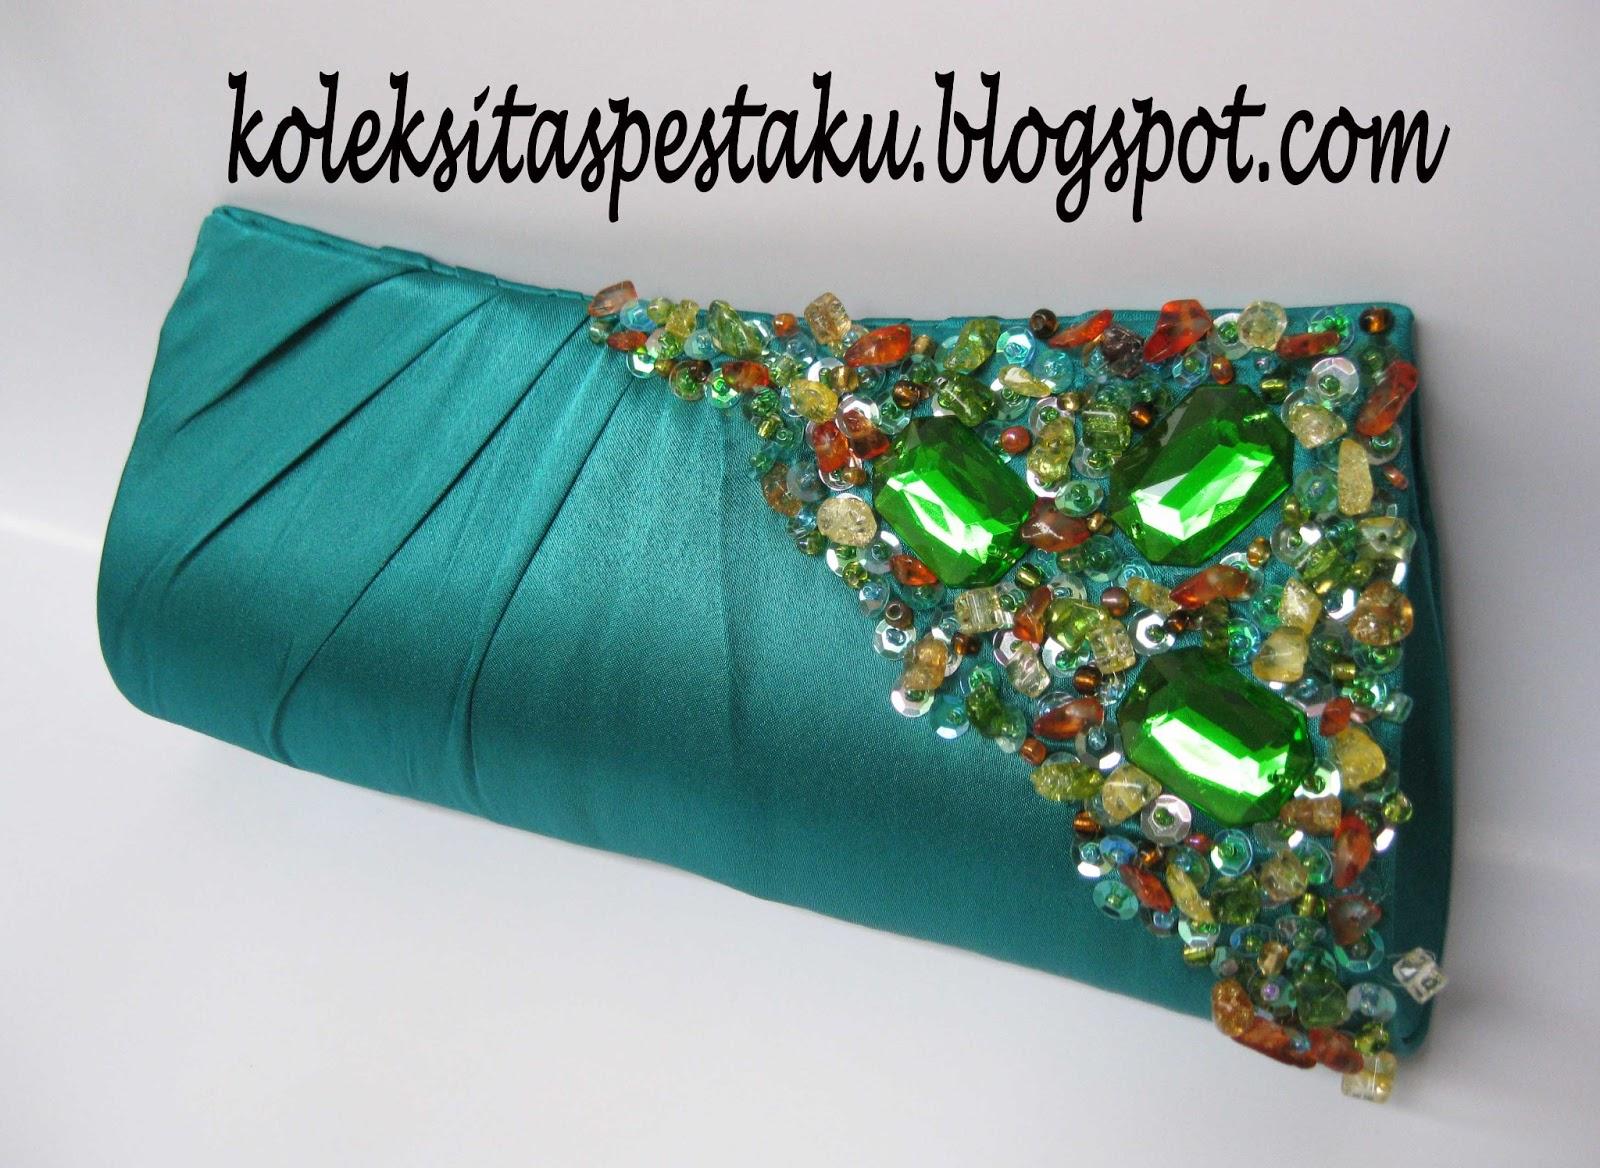 Tas Pesta - Clutch Bag  taspestaku  Clutch Bag Mewah Warna Baru Ijo ... eb8f7fef94